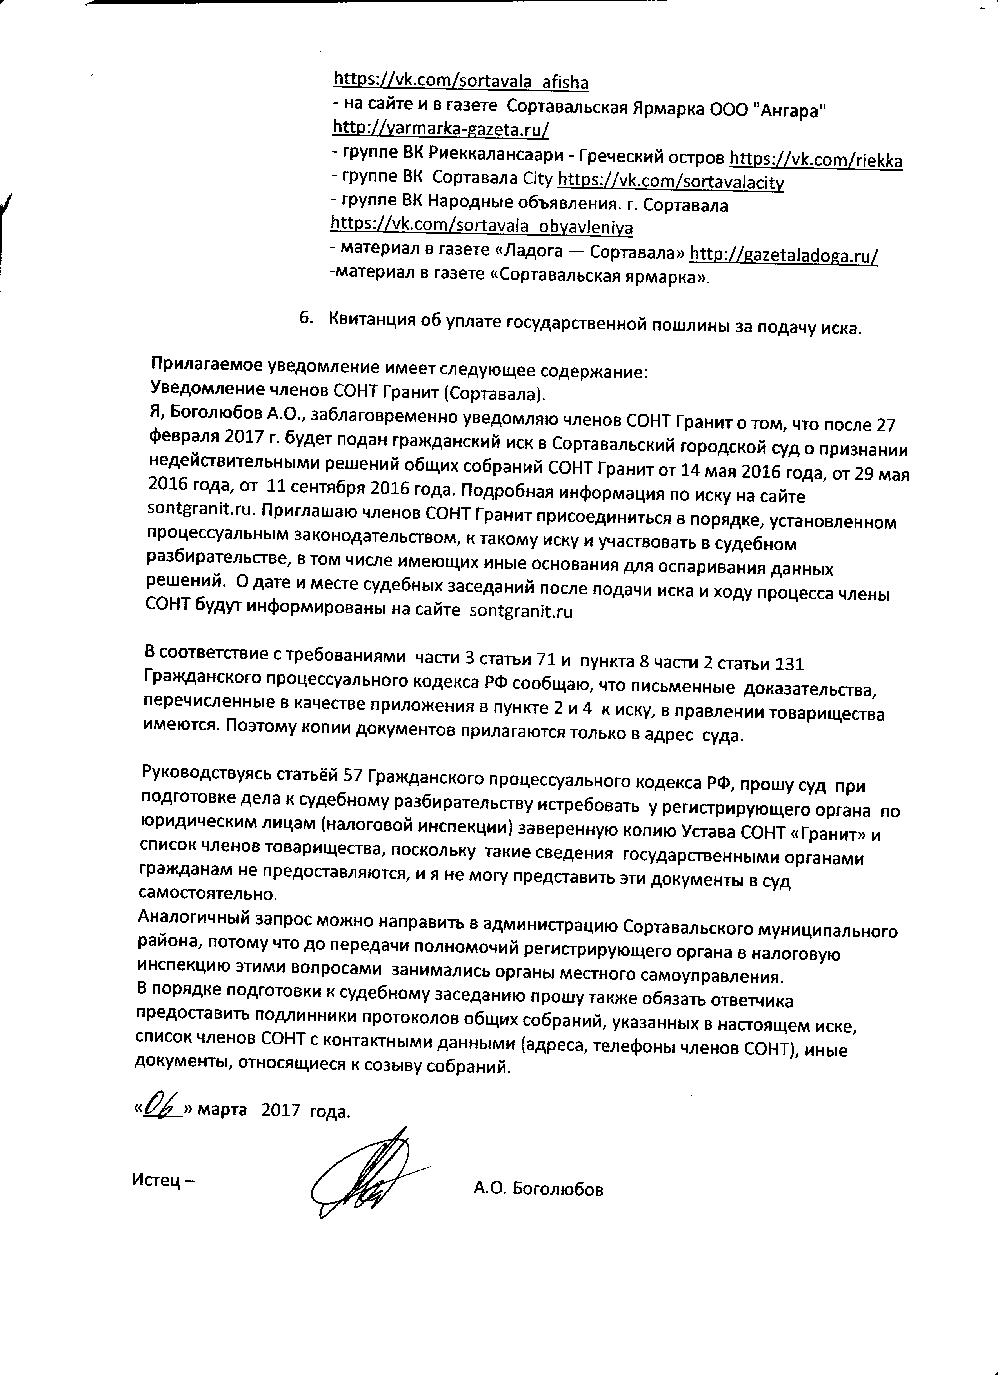 https://sontgranit.ru/forum/img/sokol/скан-иска-04.png